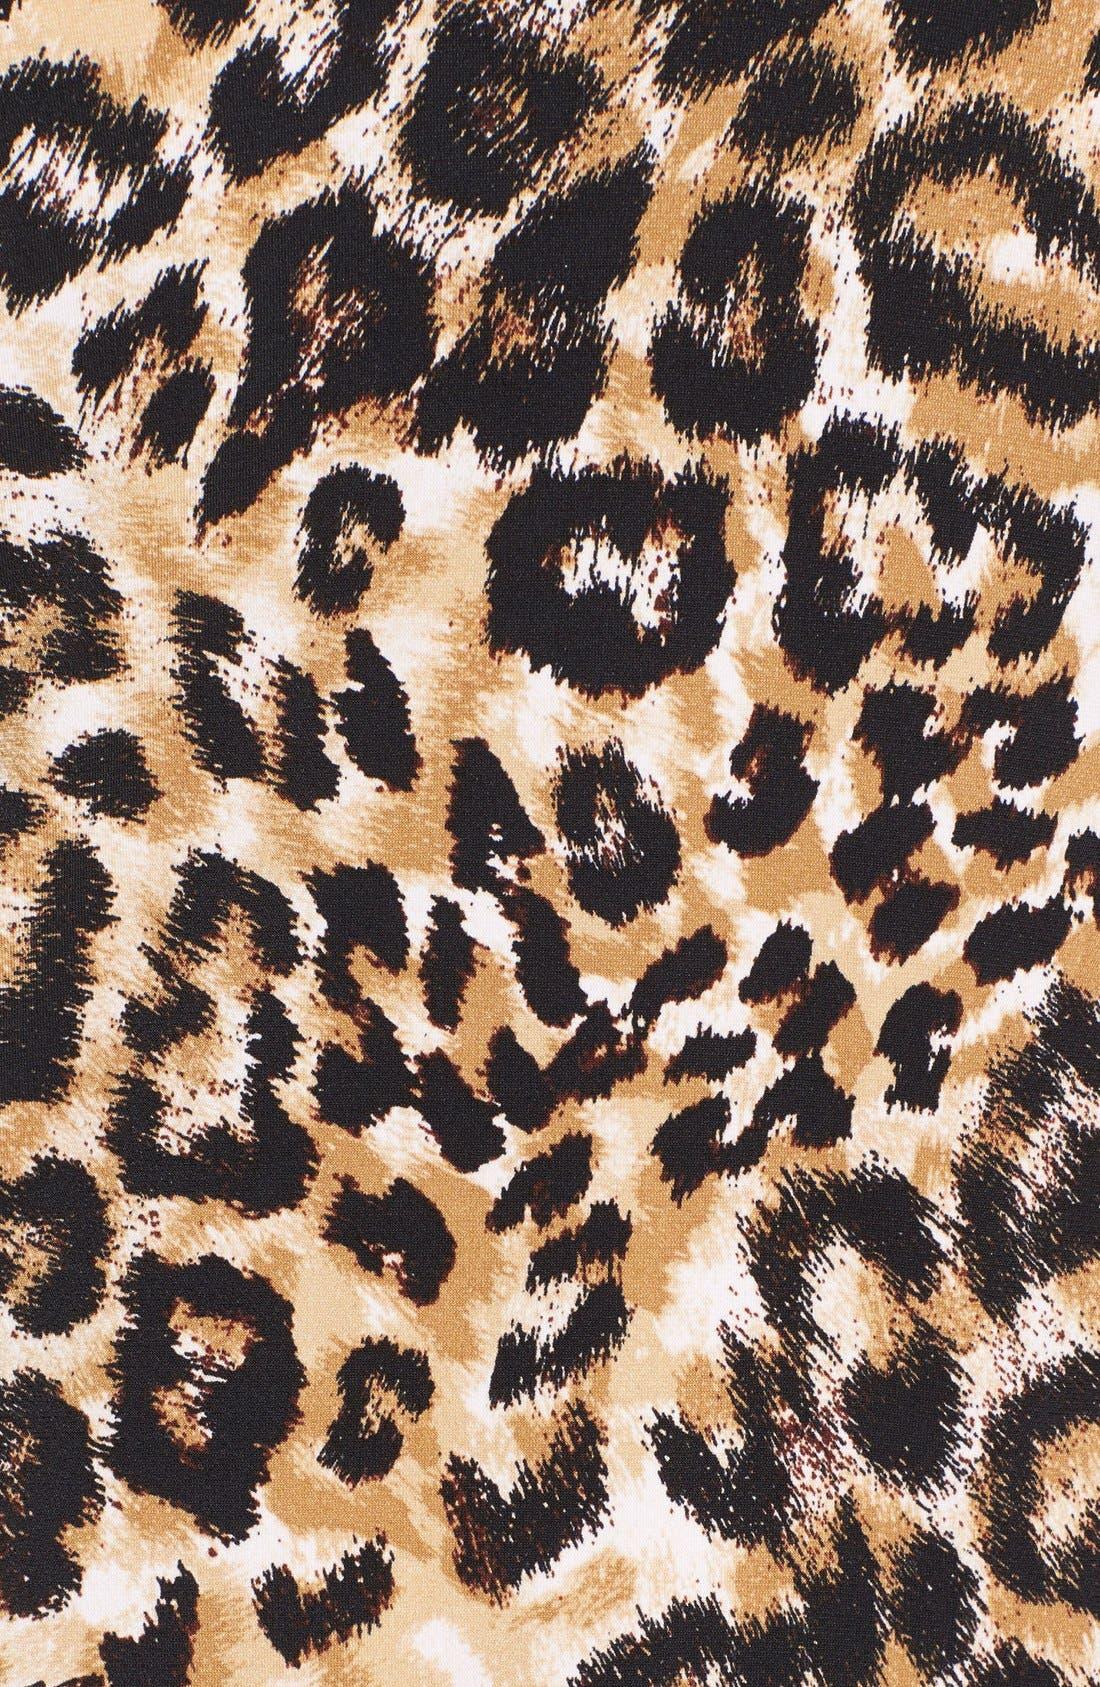 Leopard Print Pleat V-Neck Top,                             Alternate thumbnail 5, color,                             001